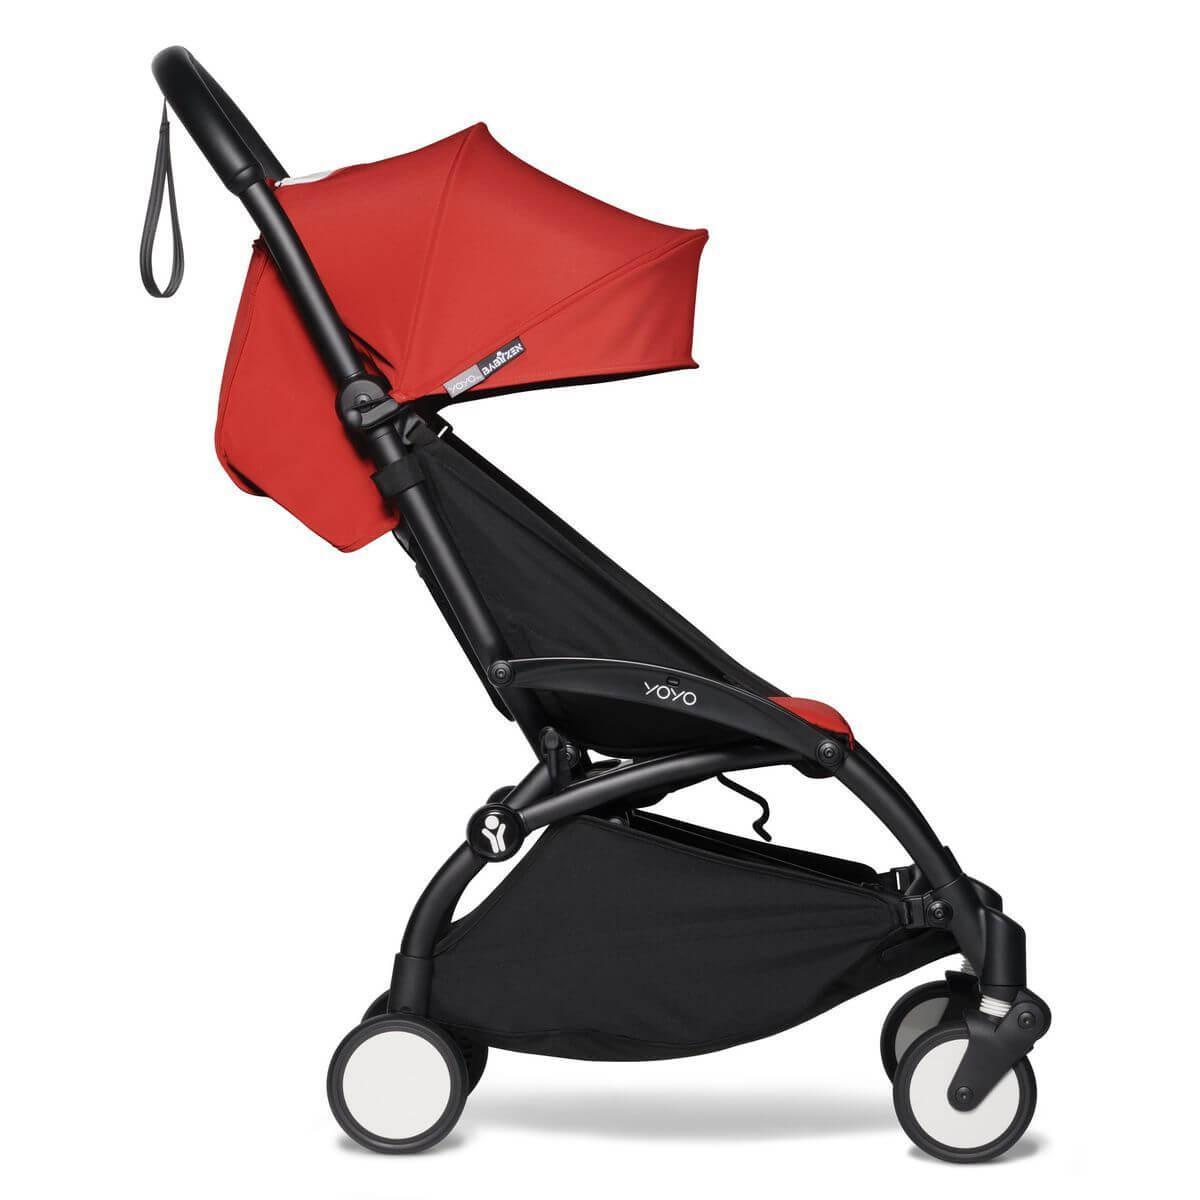 Kinderwagen BABYZEN YOYO² 6+ schwarz-rot